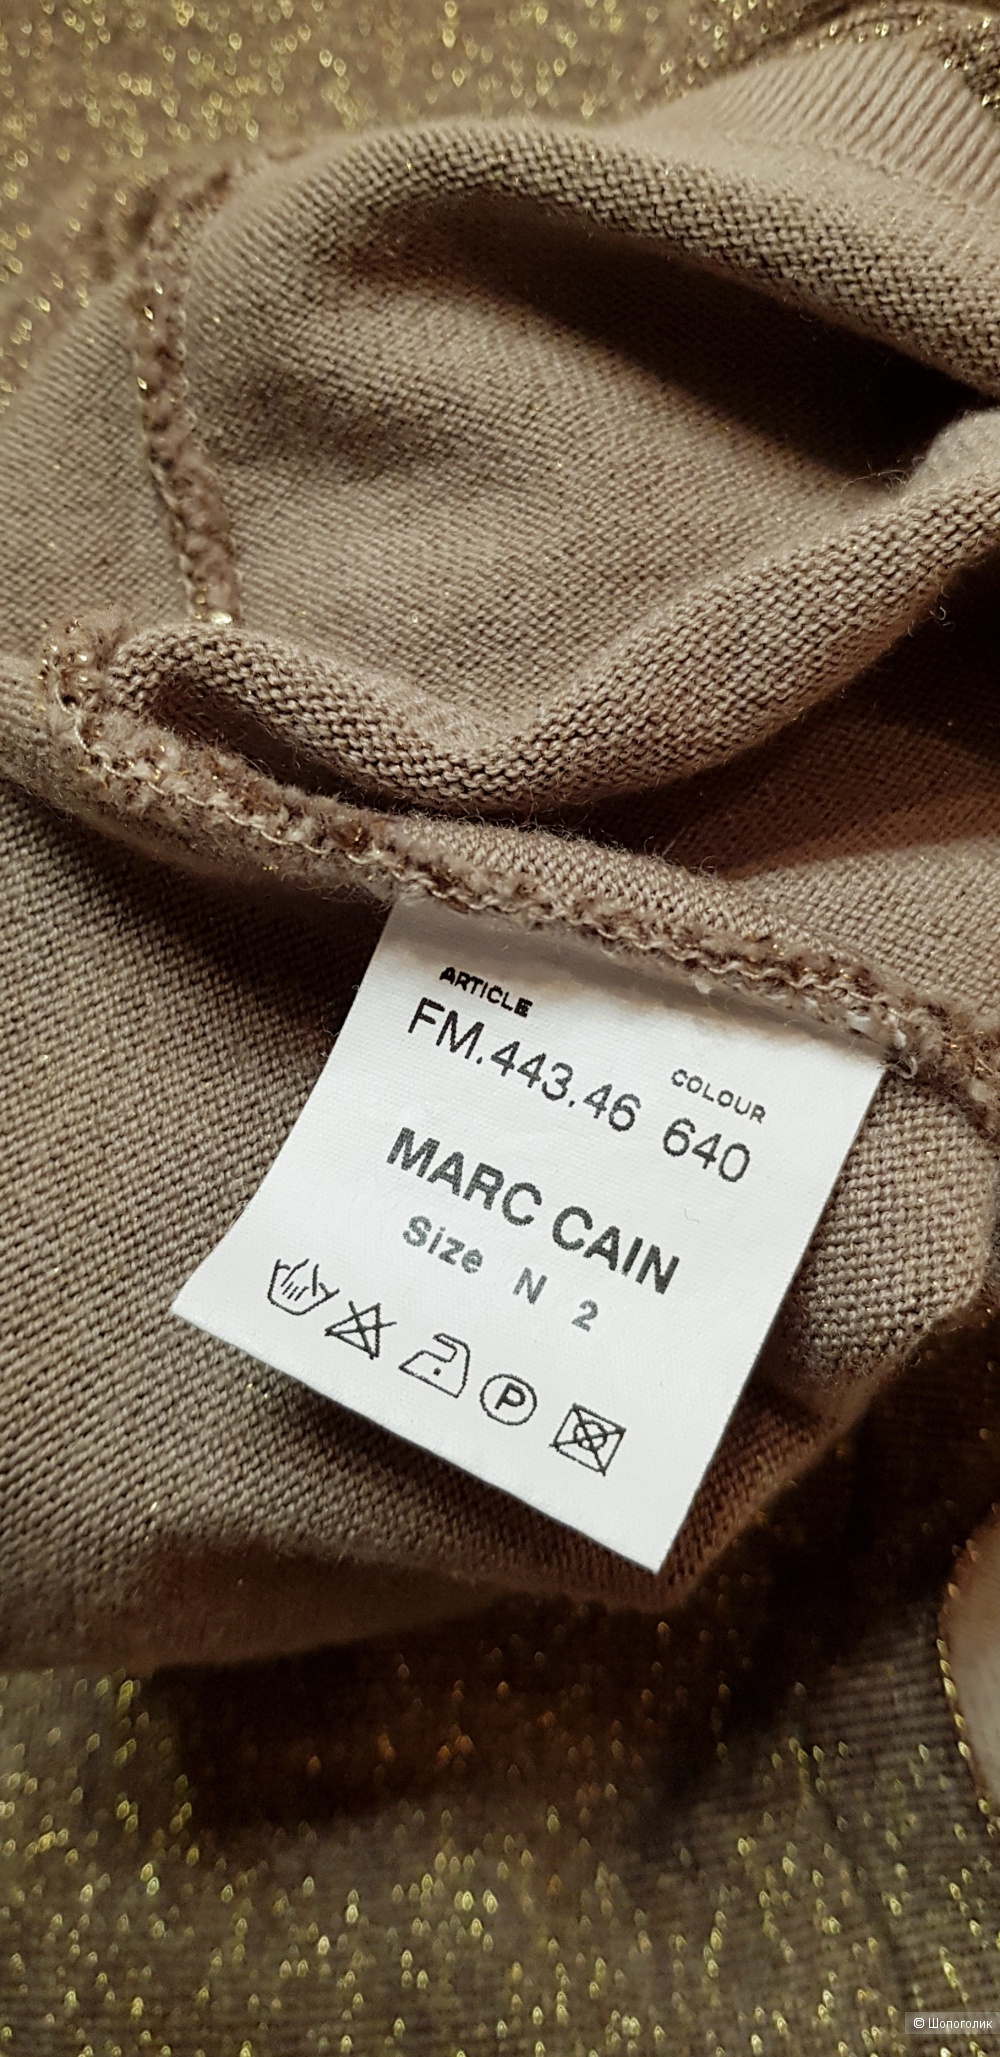 Кофта MarcCain M/44/46/